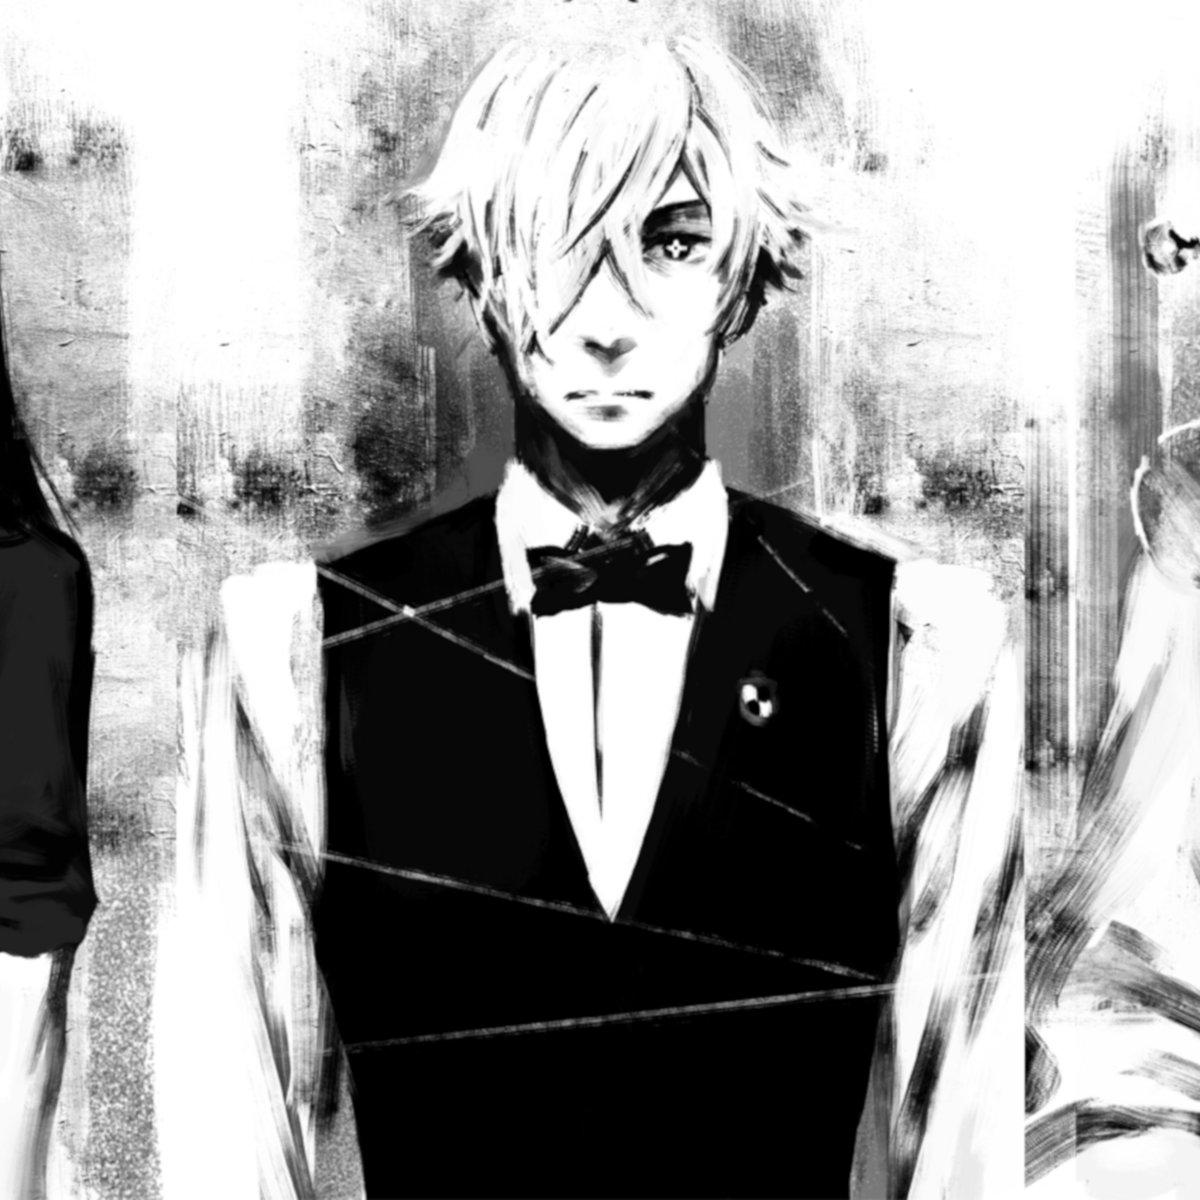 Yuki Hayashi Death Parade Reunion デス パレード 再会 Tonybtm Remix Amv Mad Tonybtm